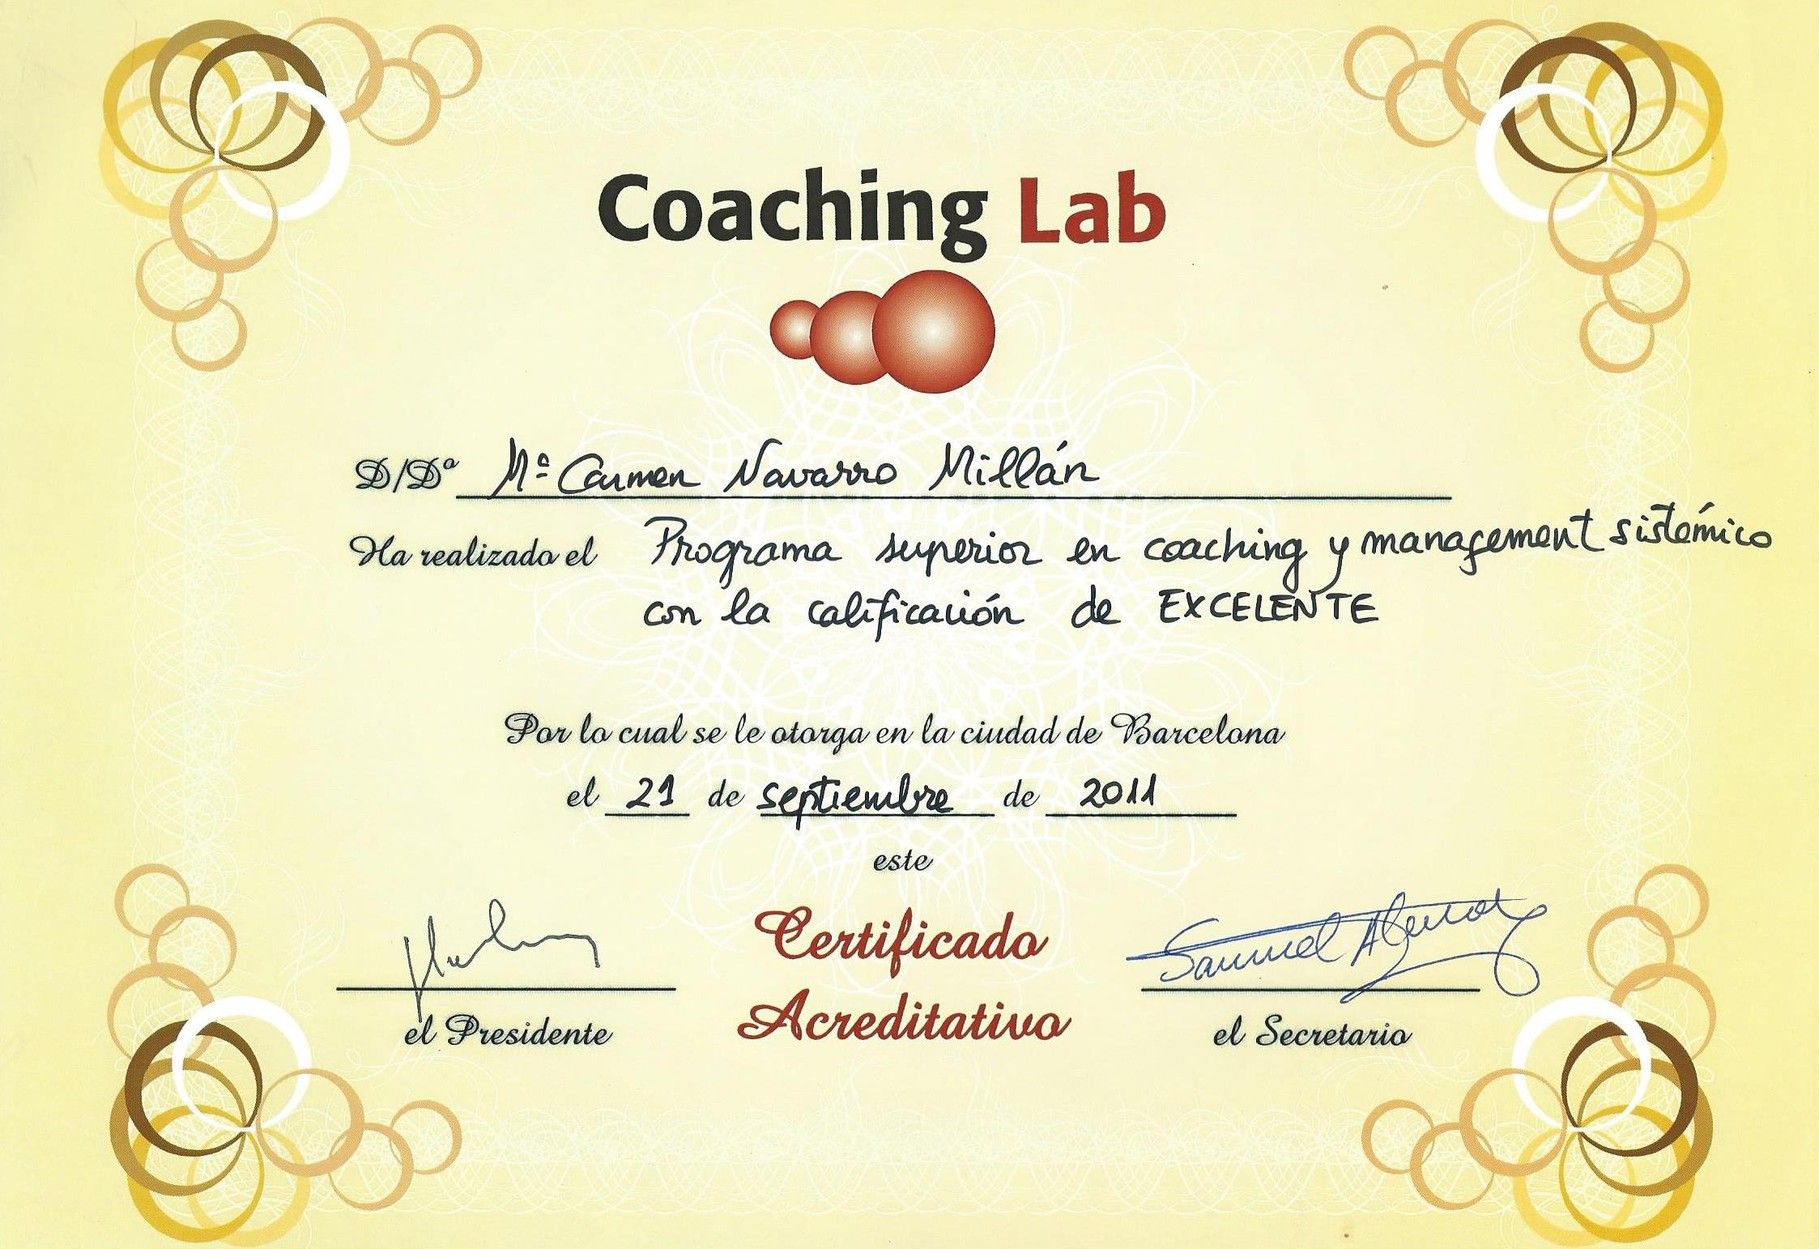 Programa superior en coaching y management sistémico